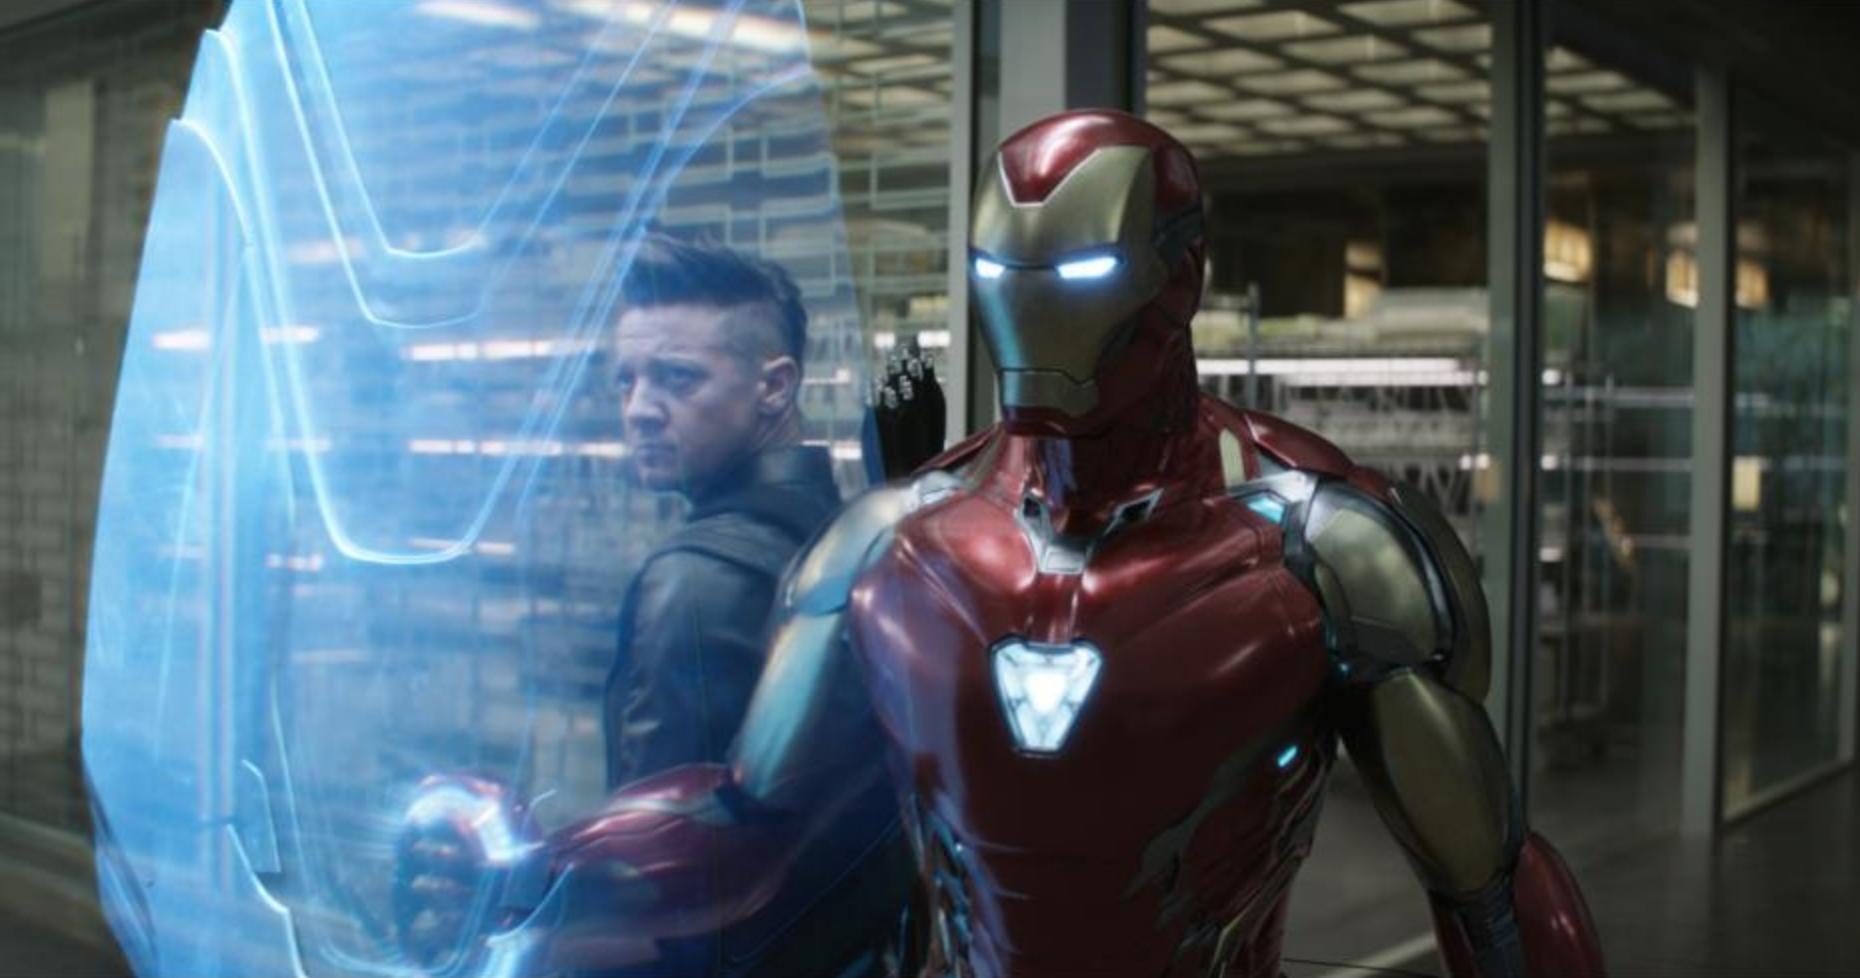 Avengers: Endgame HD Ending Images Highlight the Big Battle